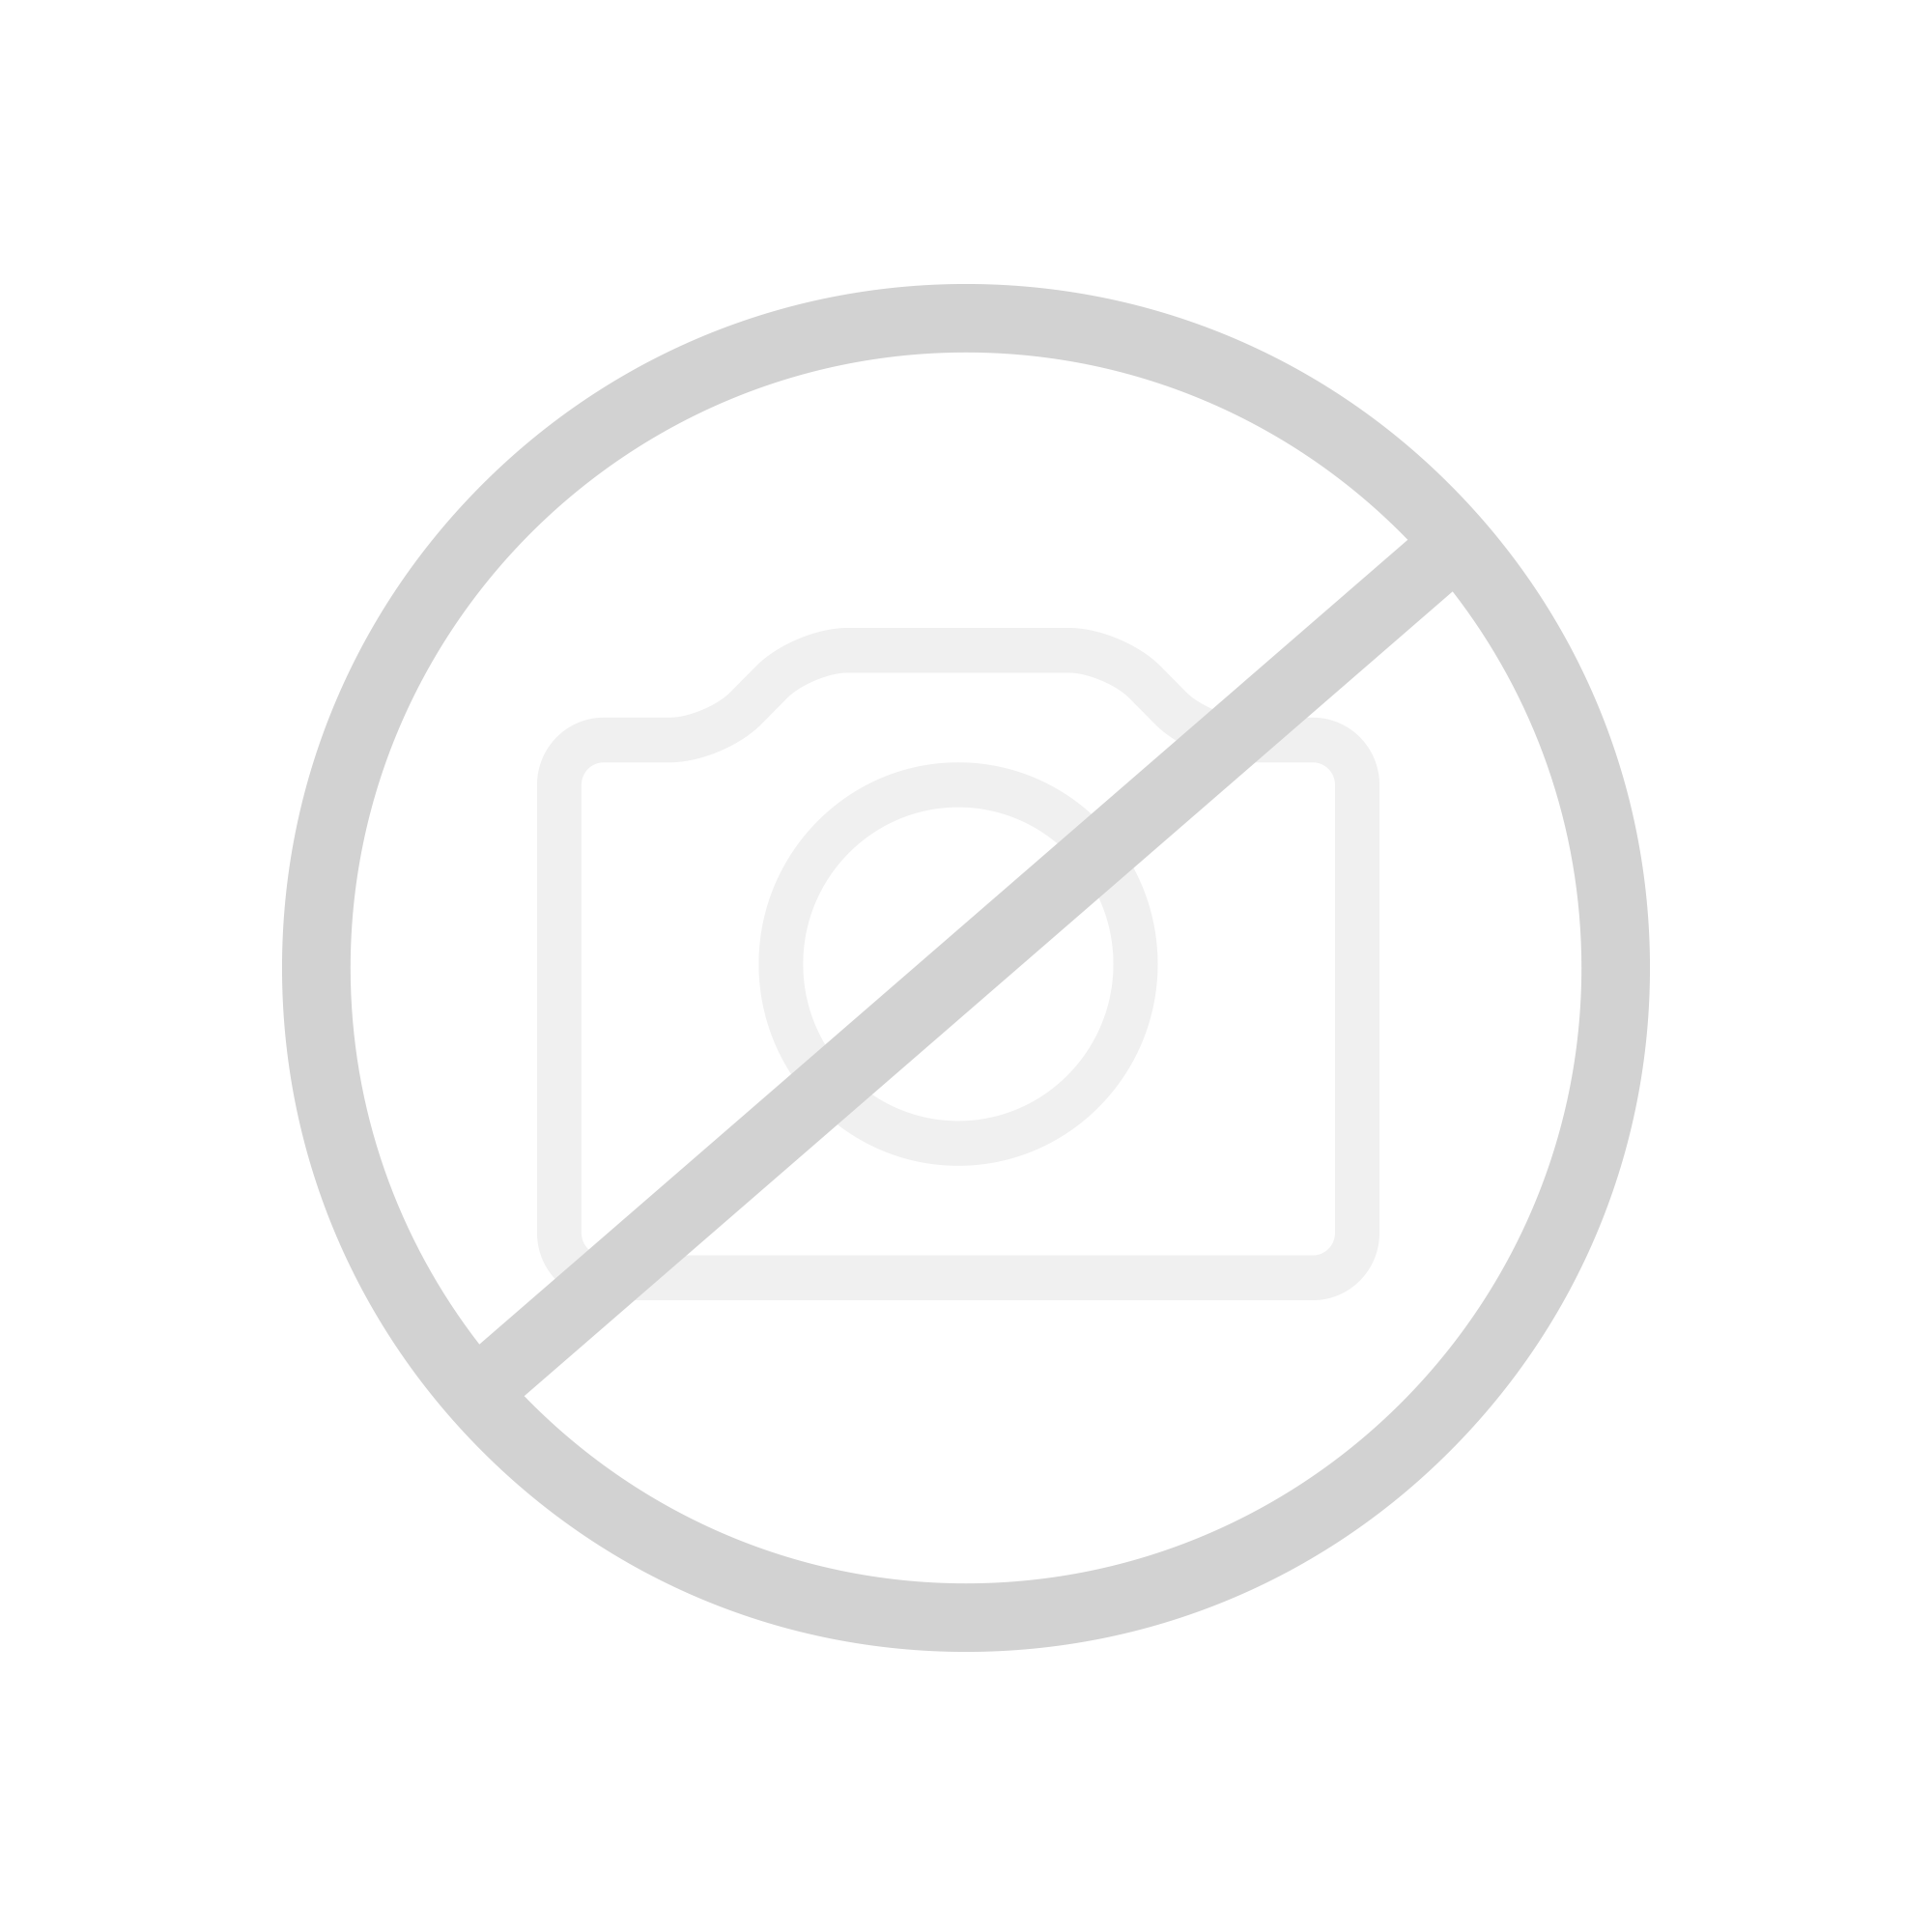 kaldewei centro duo oval badewanne m verkleidung pergamon perl effekt 282848053231 reuter. Black Bedroom Furniture Sets. Home Design Ideas